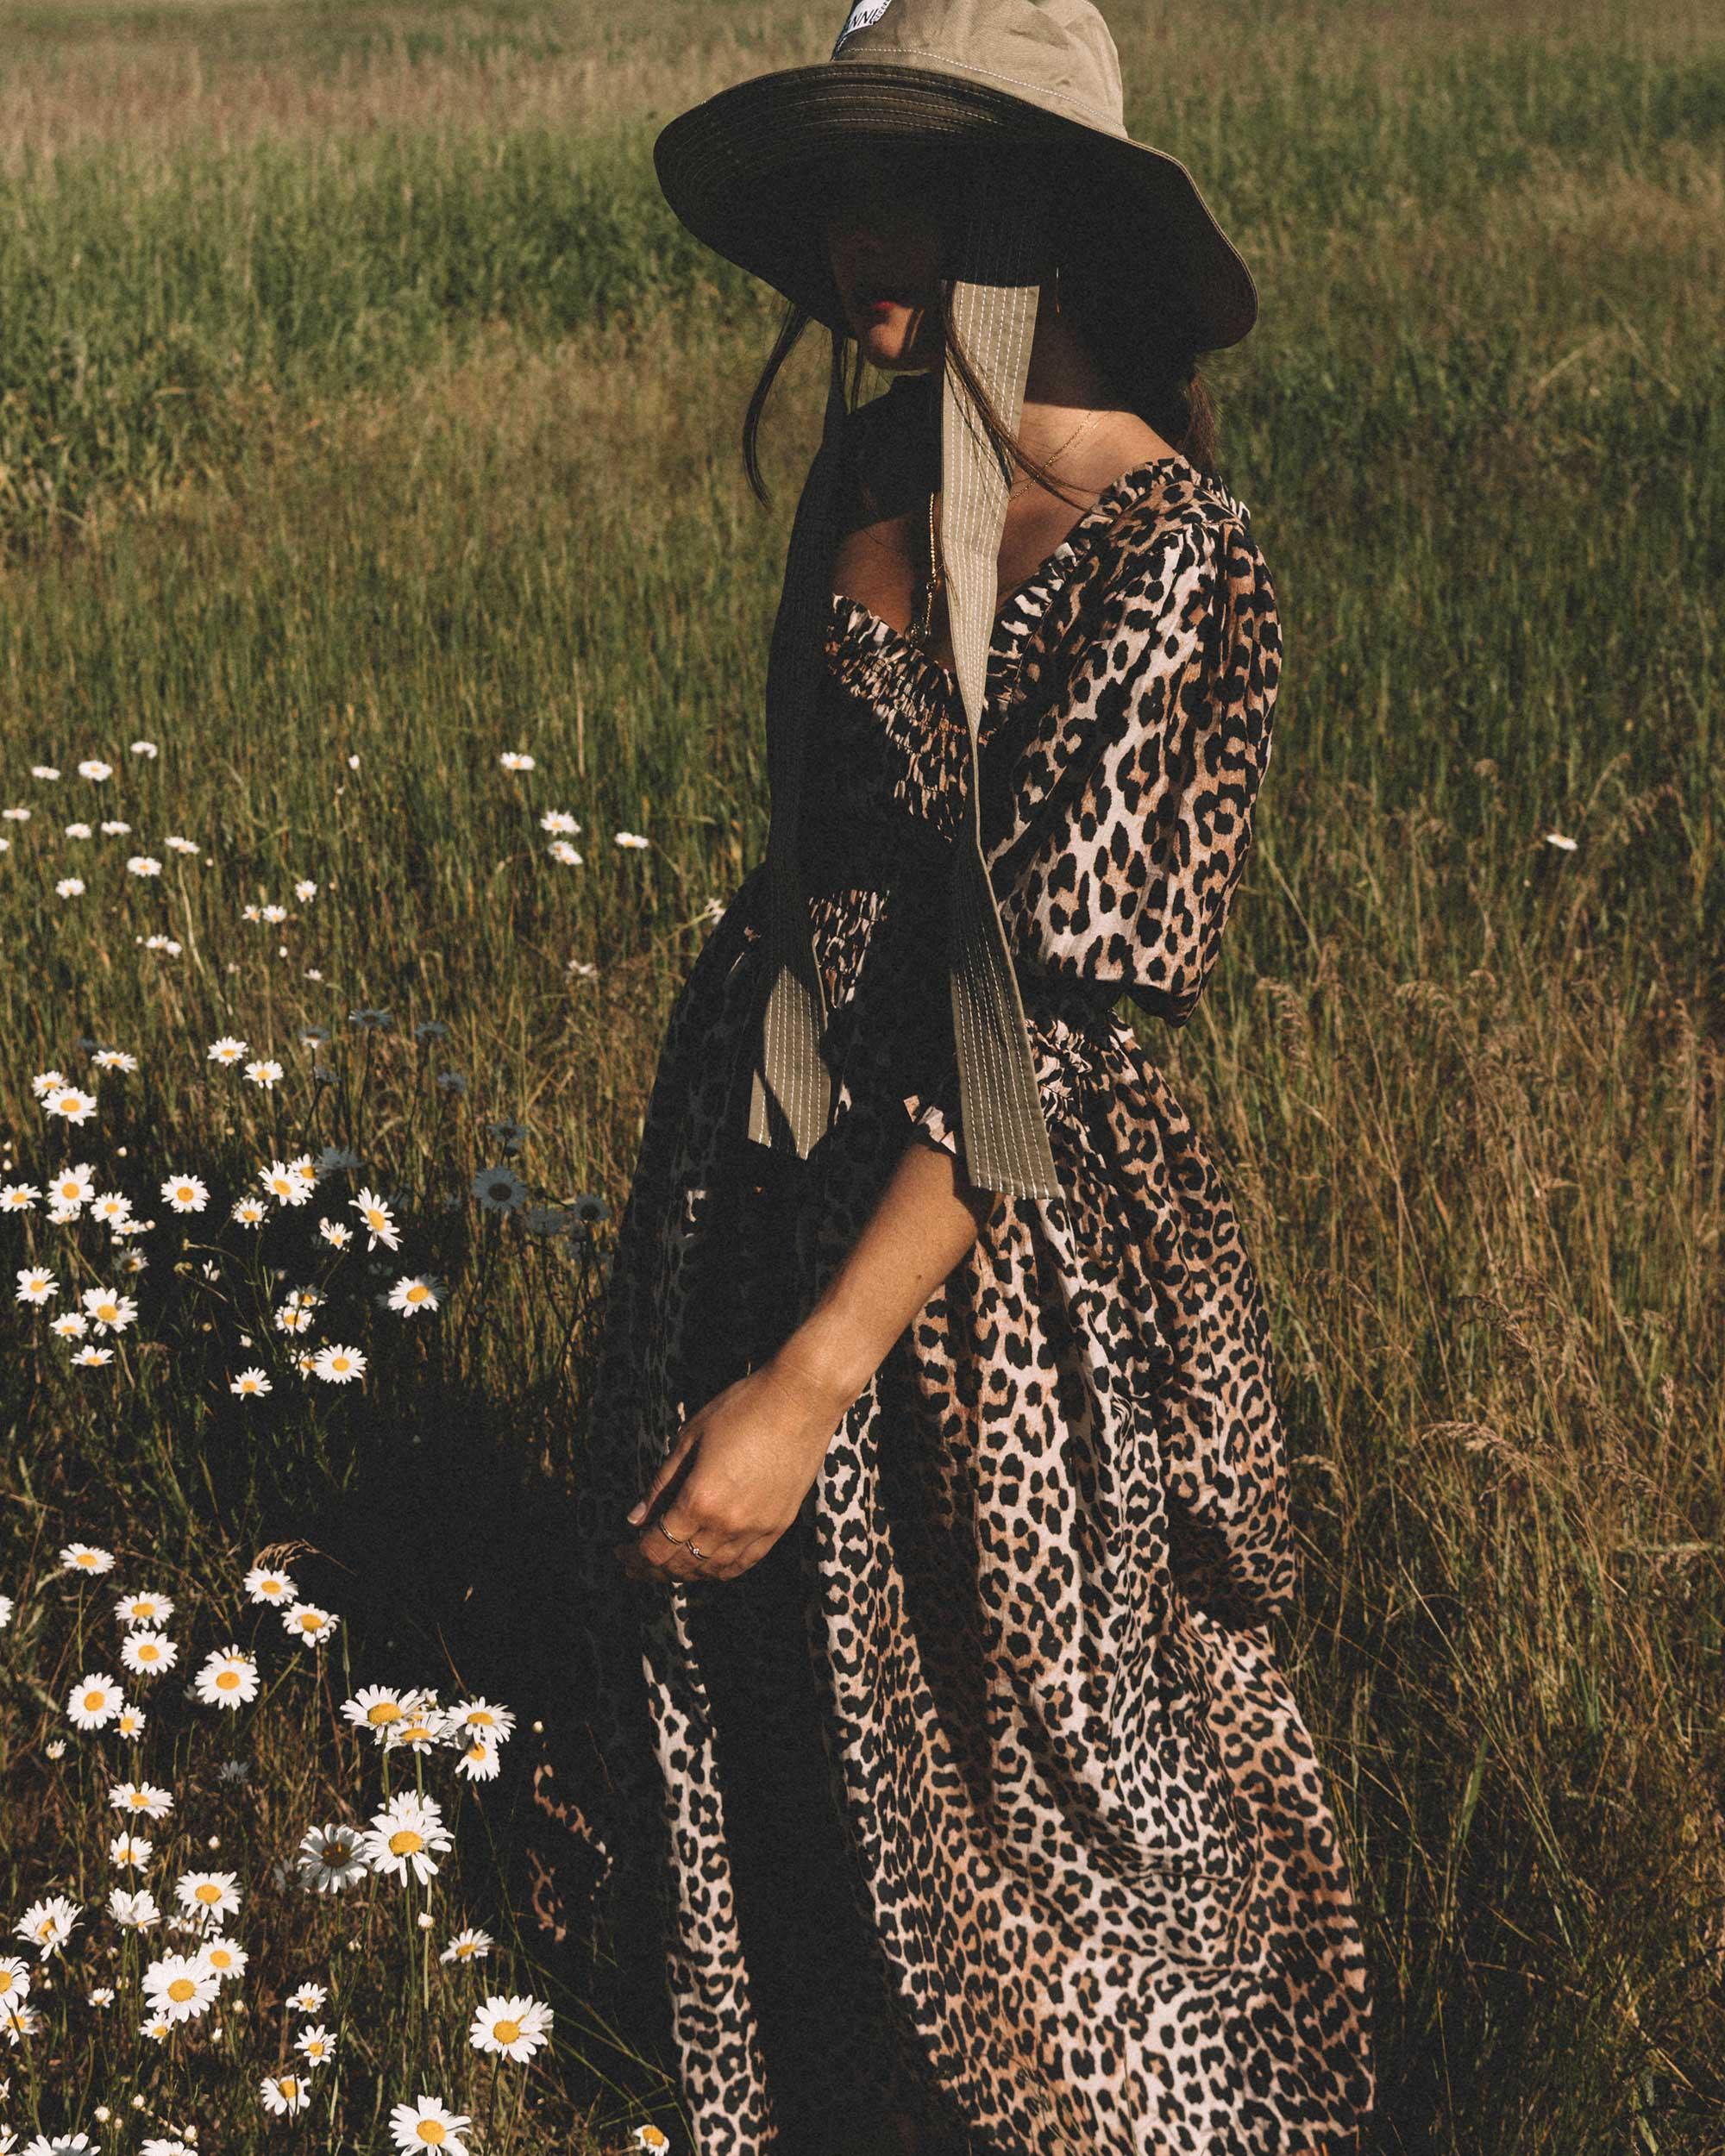 Sarah Butler of Sarah Styles wears GANNI Leopard-print Maxi Dress and GANNI wide brim hat in Seattle, Washington Feild | @sarahchristine --10.jpg